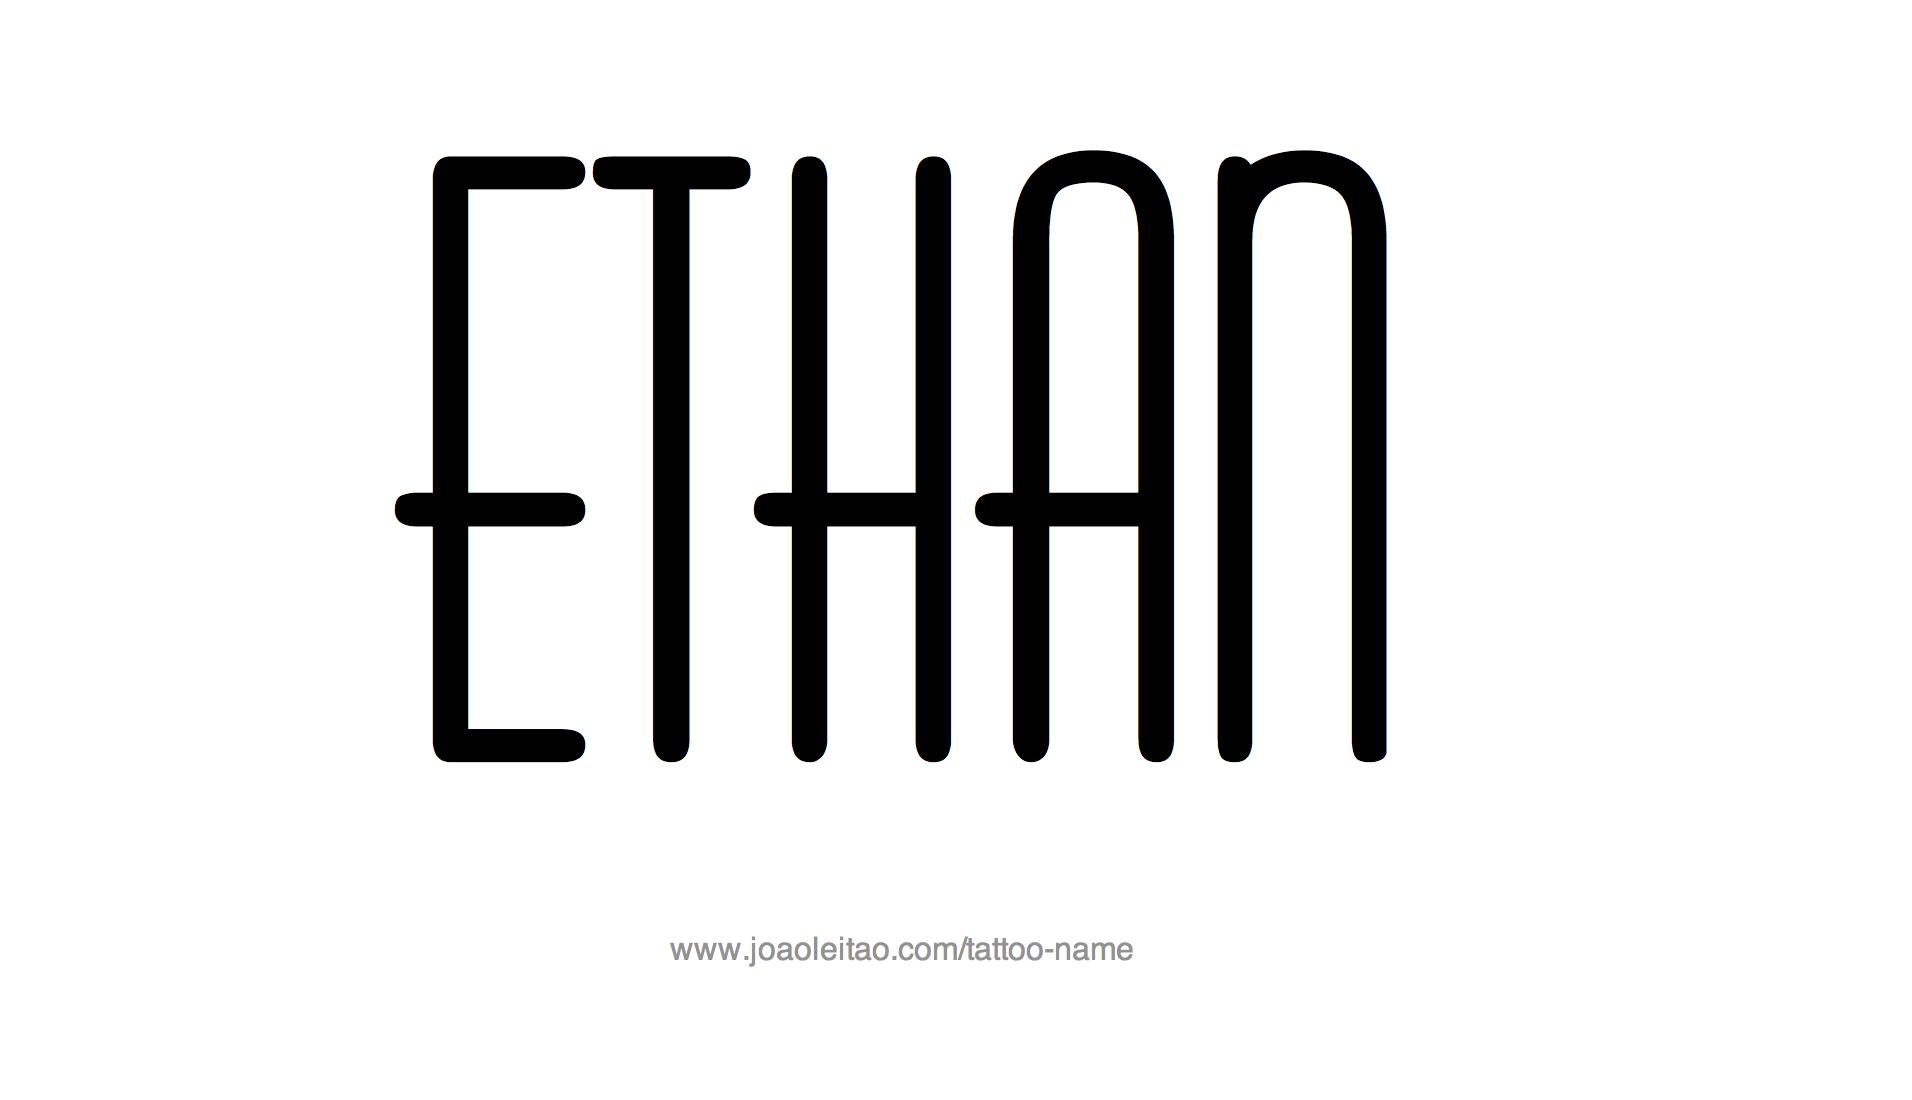 Ethan Name Tattoo Designs